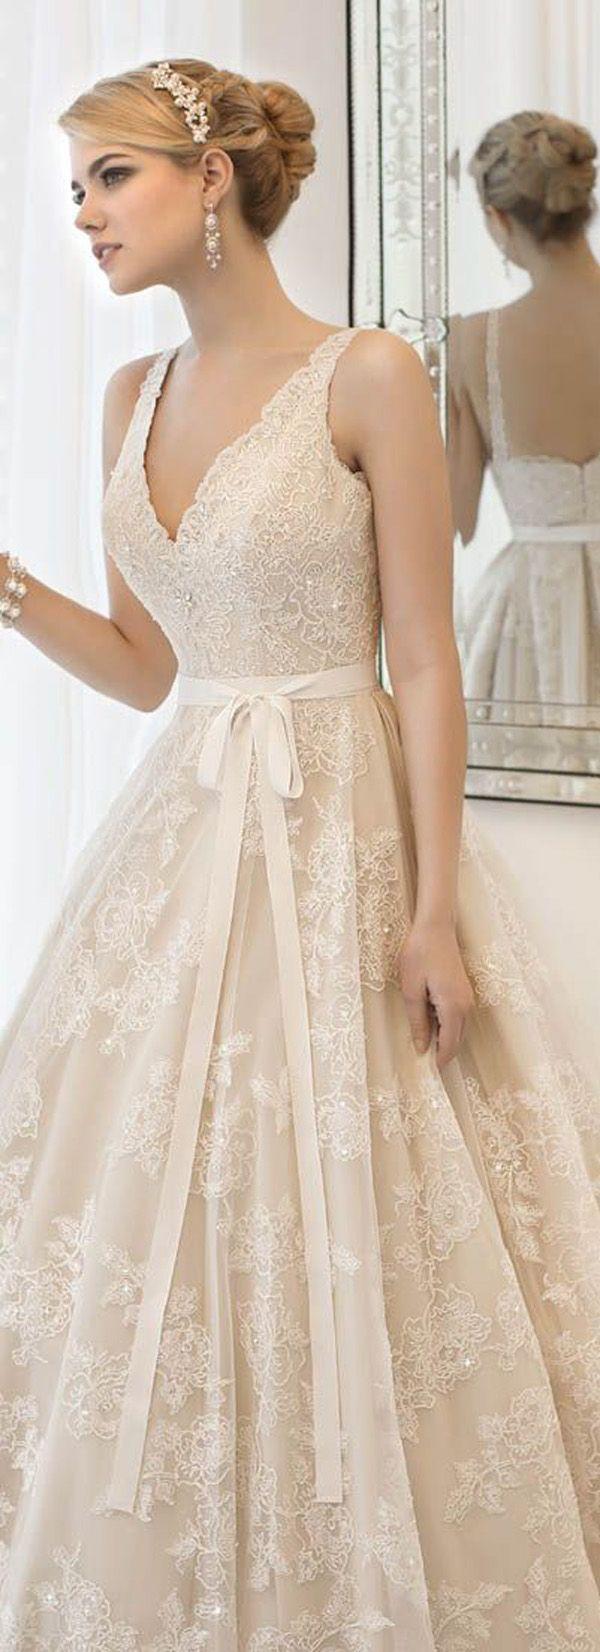 Vintage wedding dresses on pinterest explore ideas with